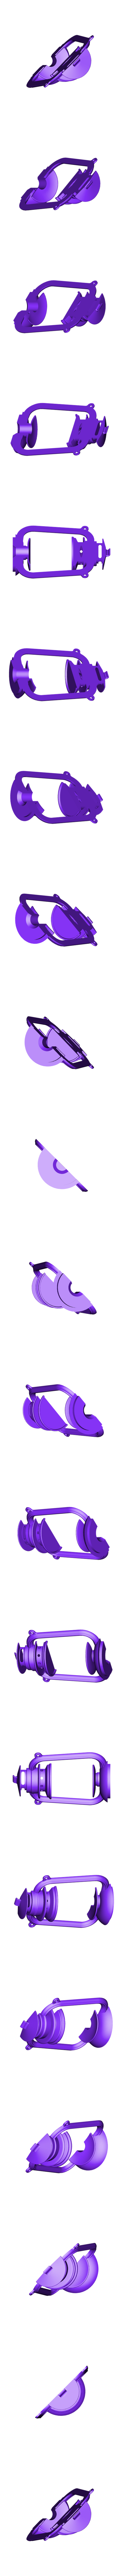 left.stl Download free STL file Shining Lantern • 3D printer object, blecheimer